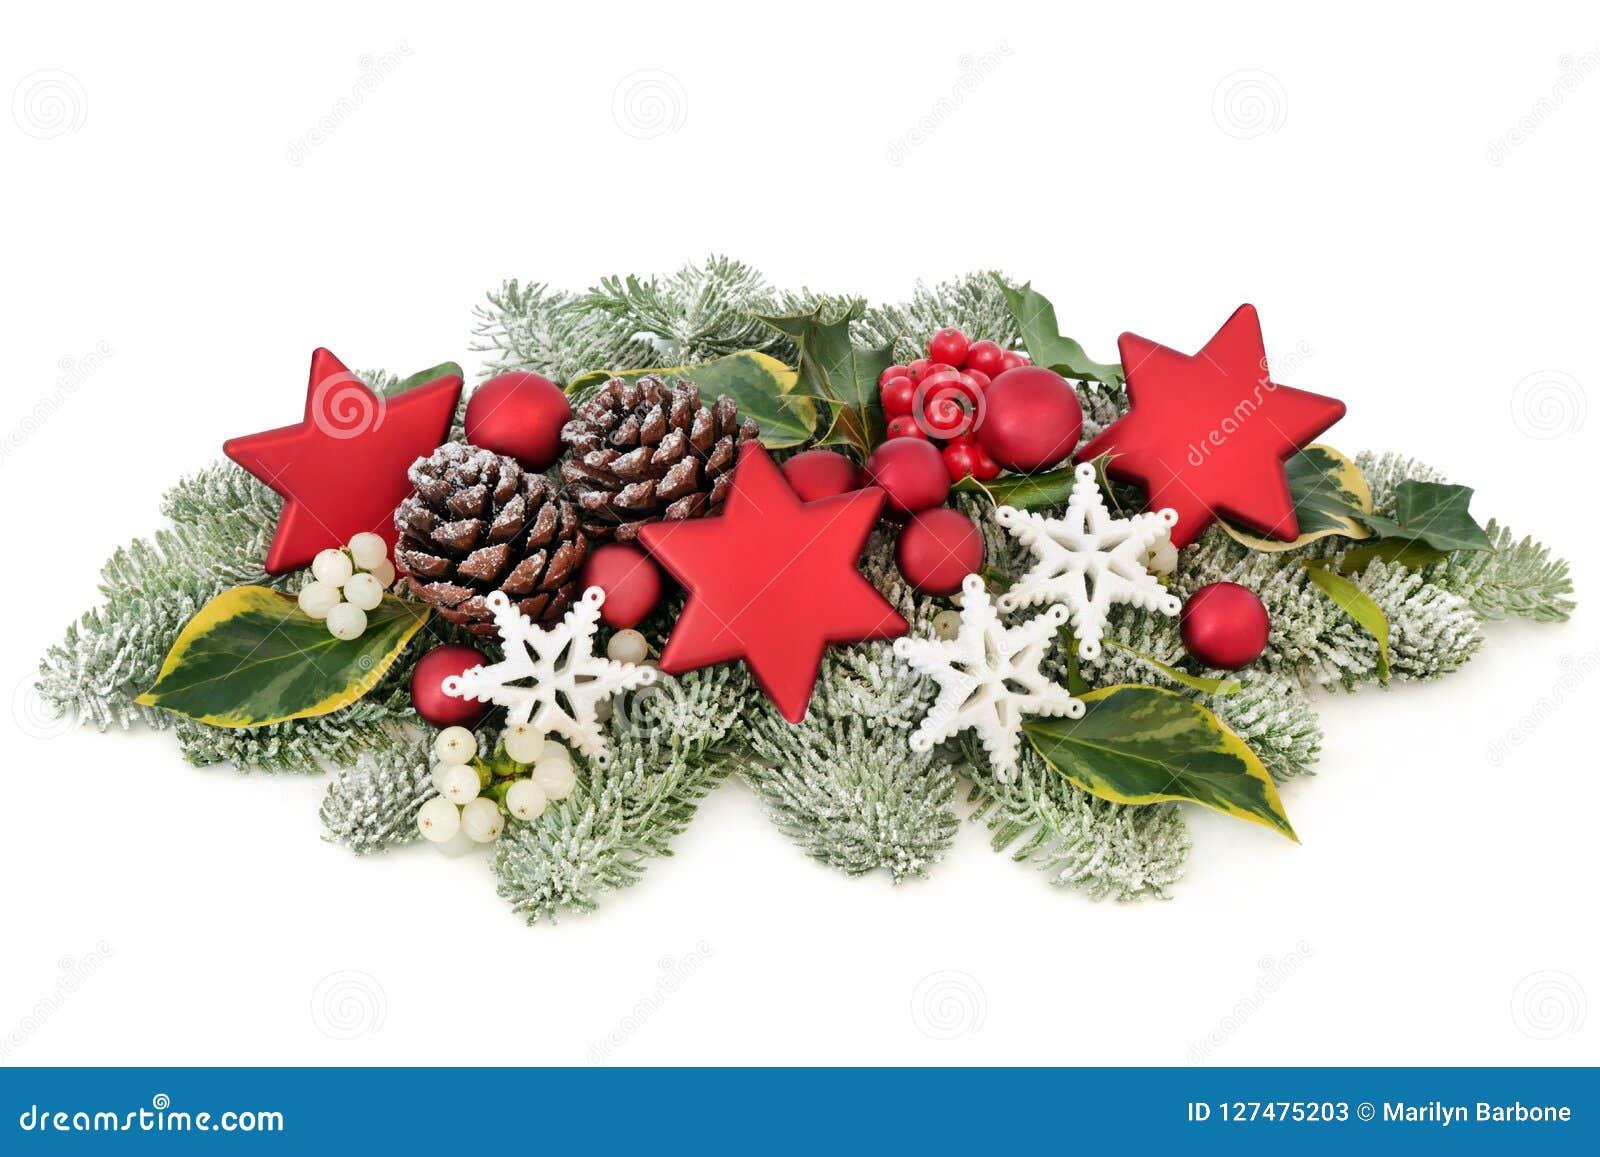 Christmas Festive Table Decoration Stock Image Image Of Christmas